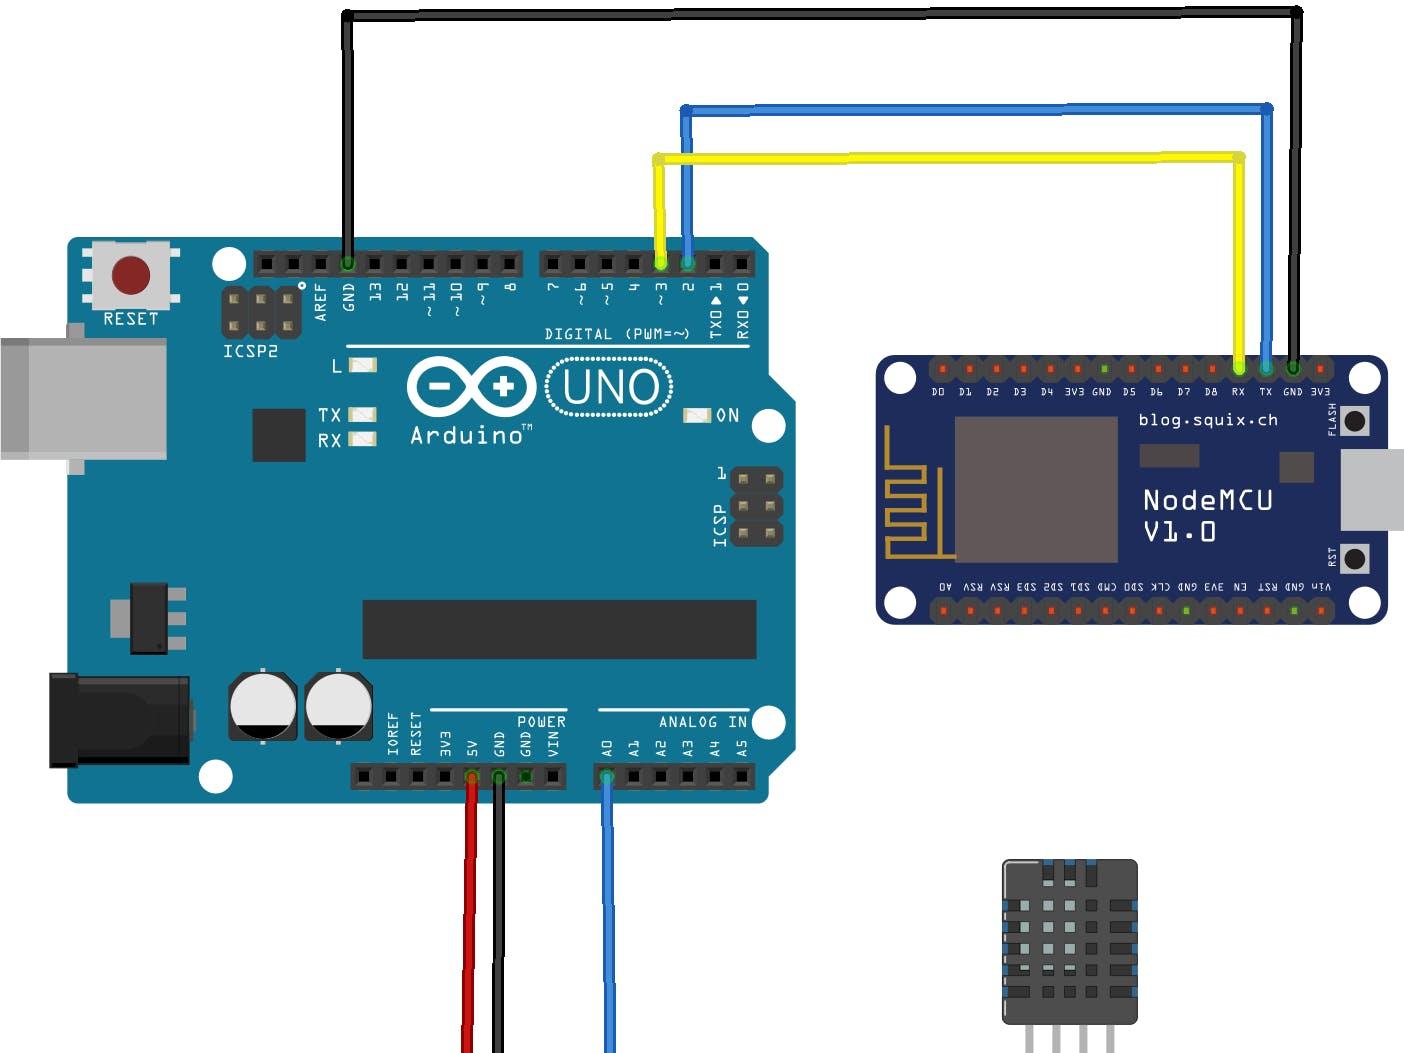 Arduino Nodemcu Iayuqaxyv on Arduino Mega Pinout Diagram